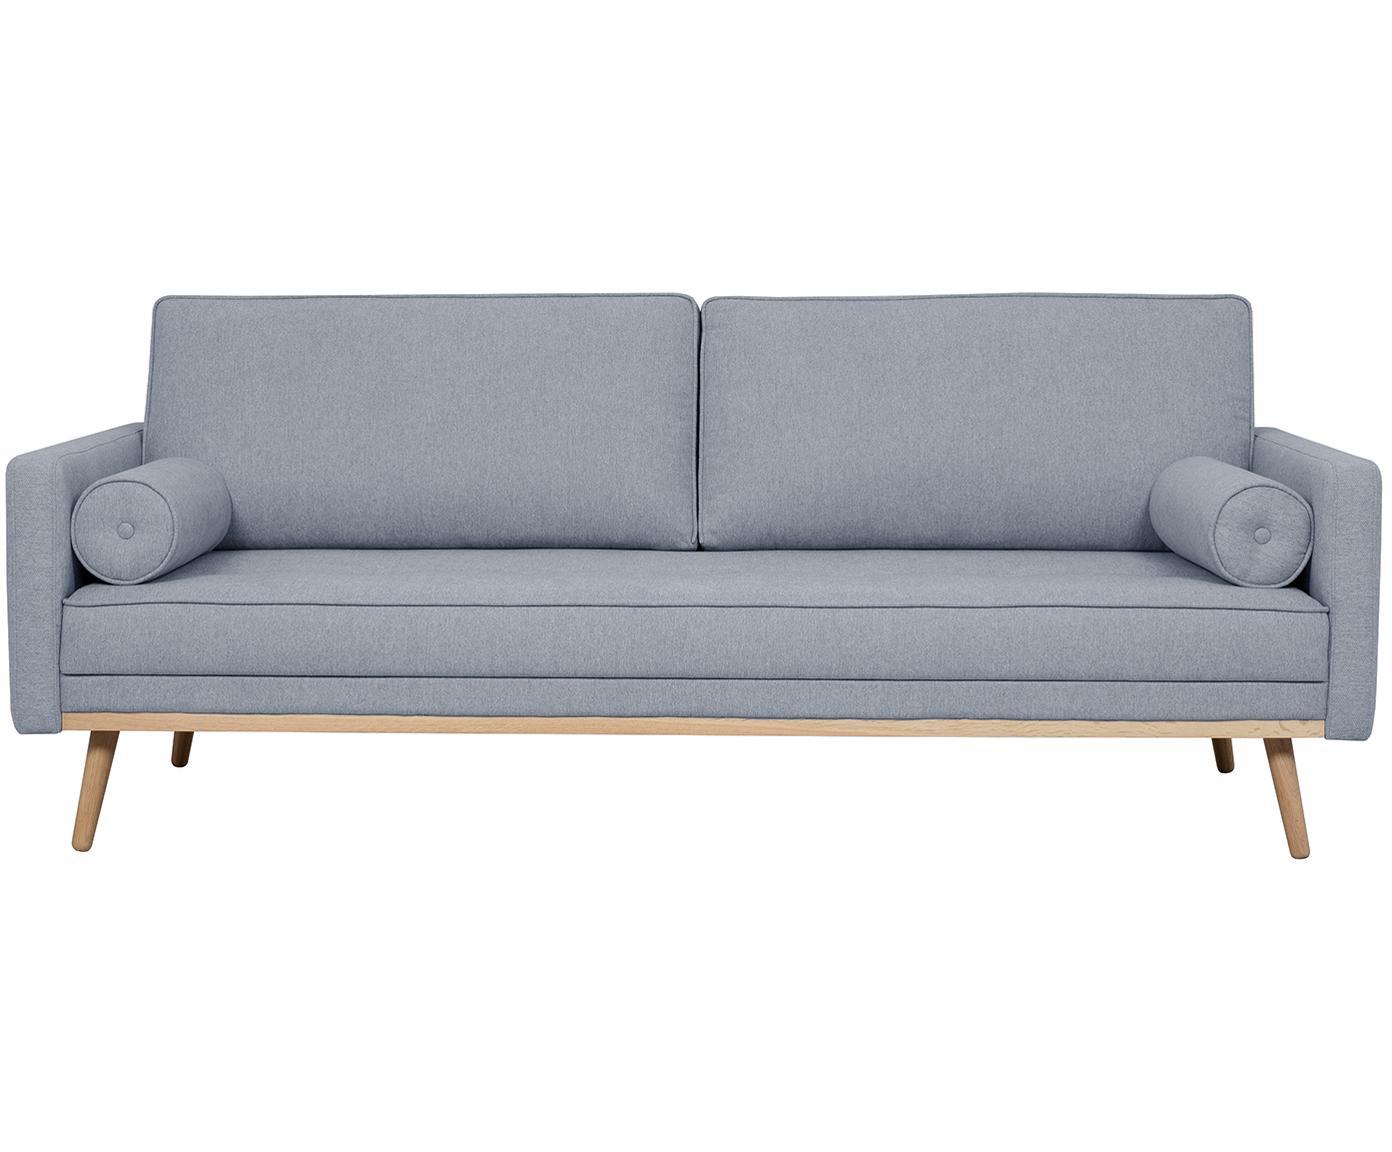 Sofa Saint (3-Sitzer), Bezug: Polyester 50.000 Scheuert, Gestell: Massives Kiefernholz, Spa, Webstoff Blaugrau, 210 x 70 cm